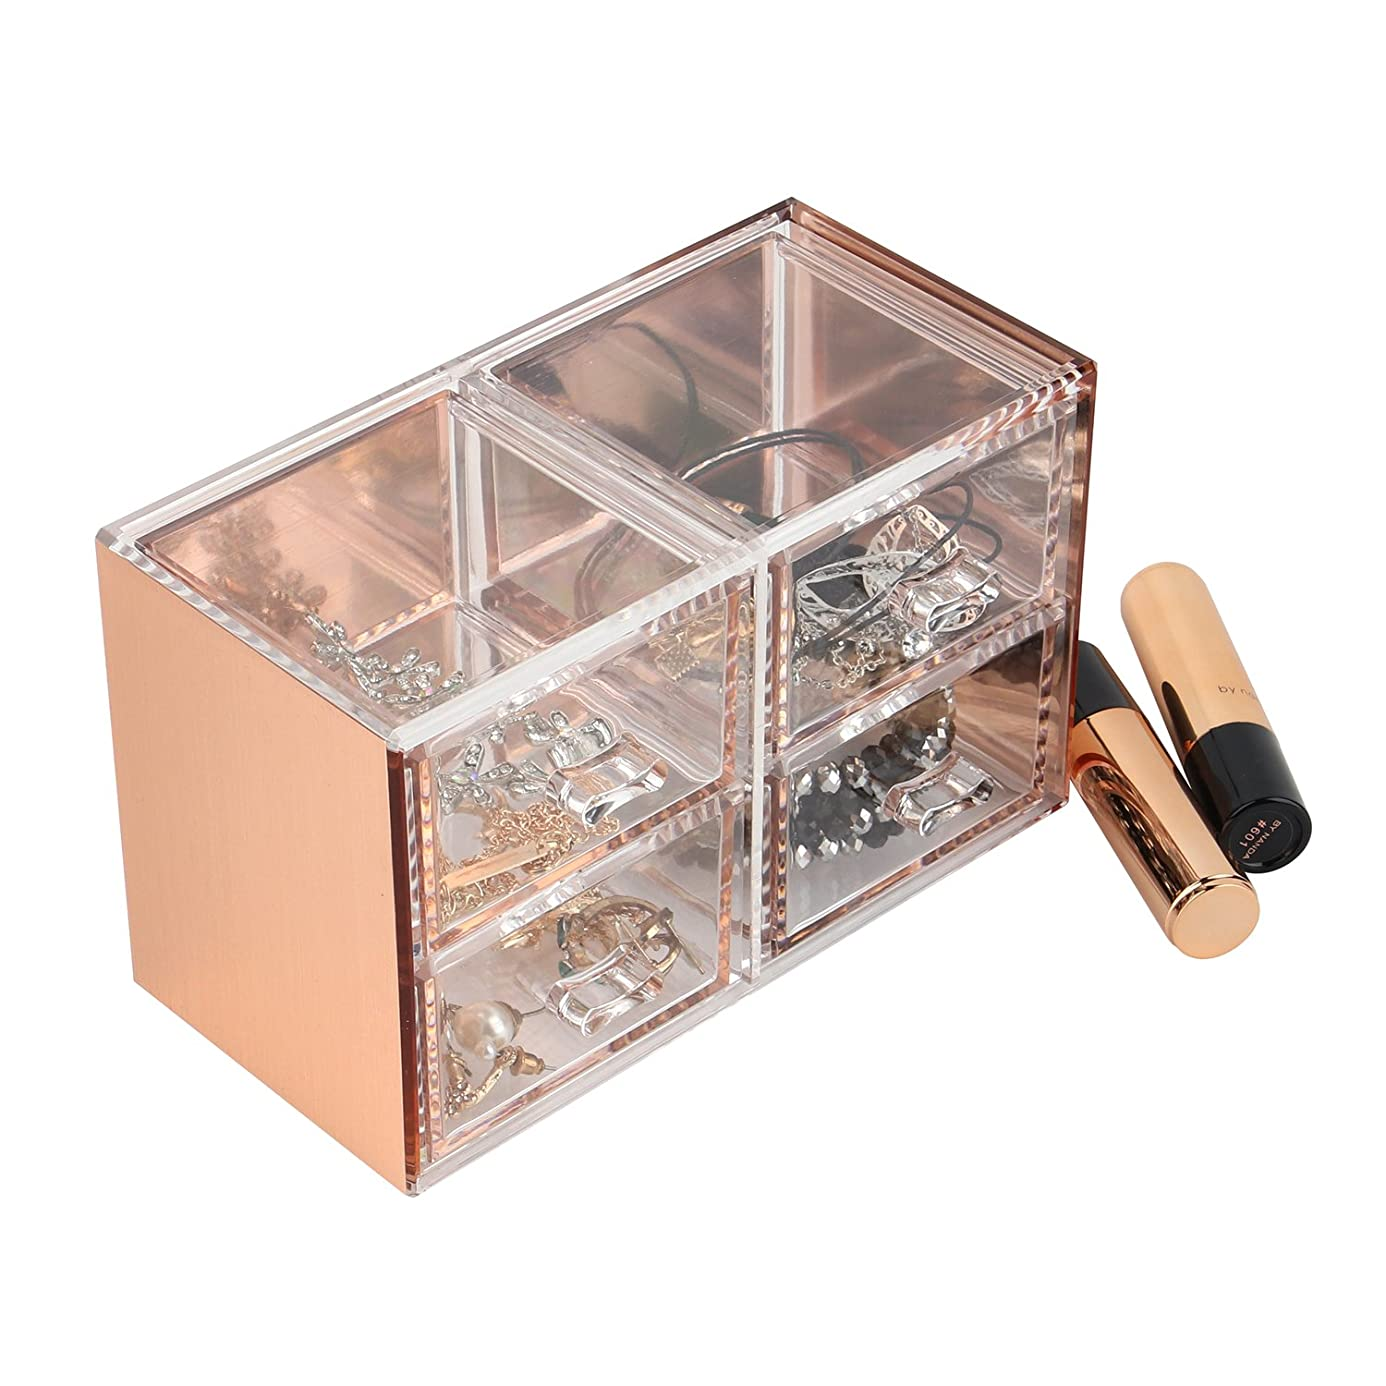 Moosy Life Rose Gold Acrylic Desk Organizer, Jewelry Box, 4 Drawers cov3165924